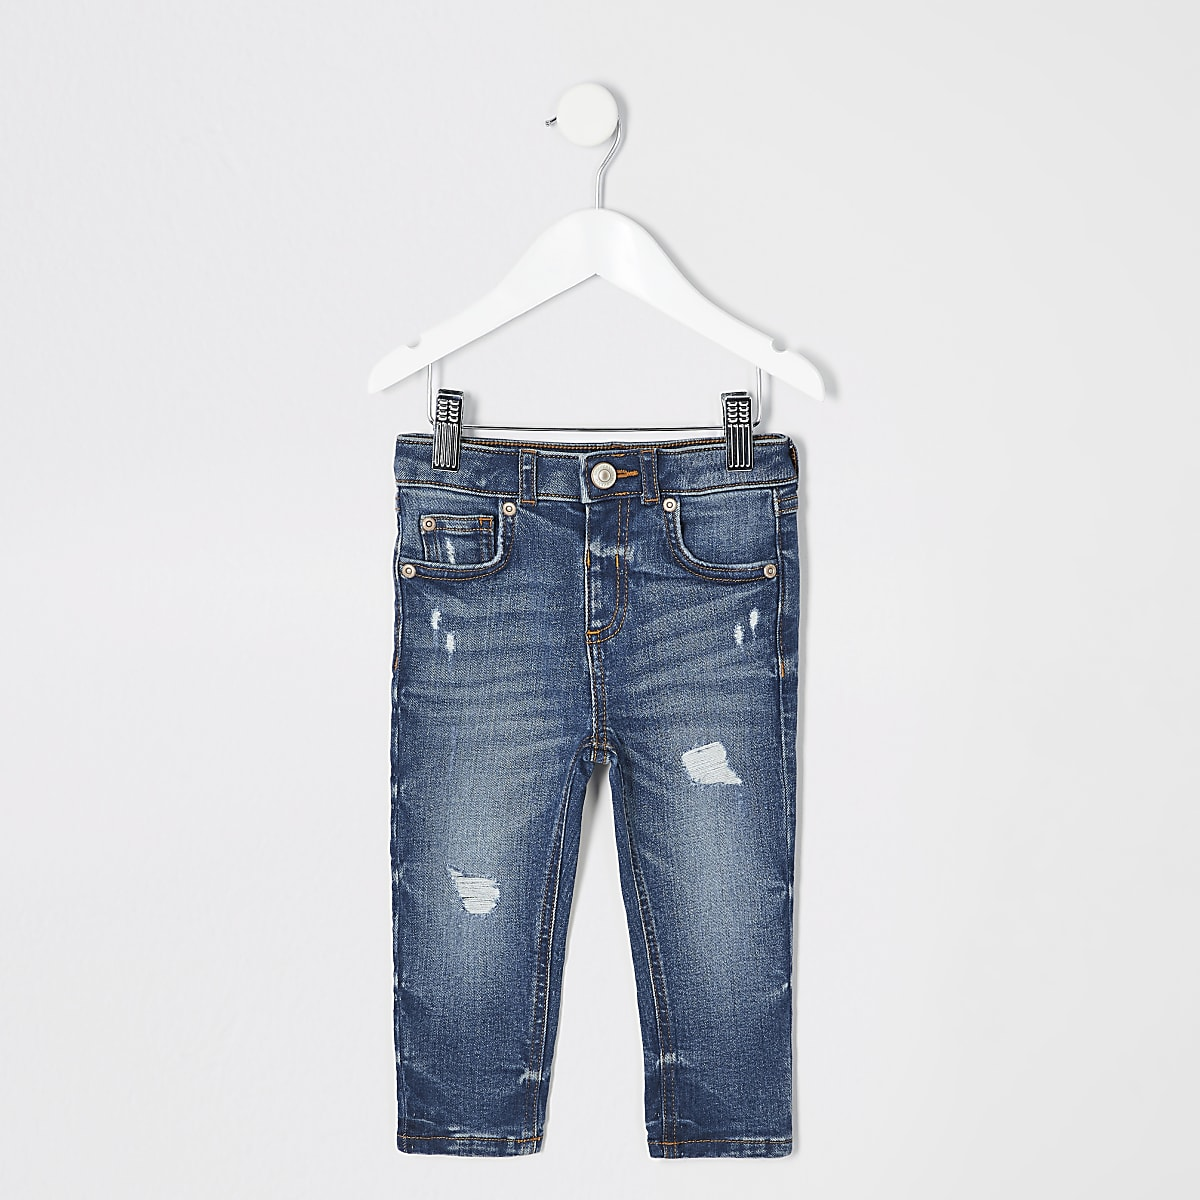 Mini - Sid - Middenblauwe ripped skinny jeans voor jongens